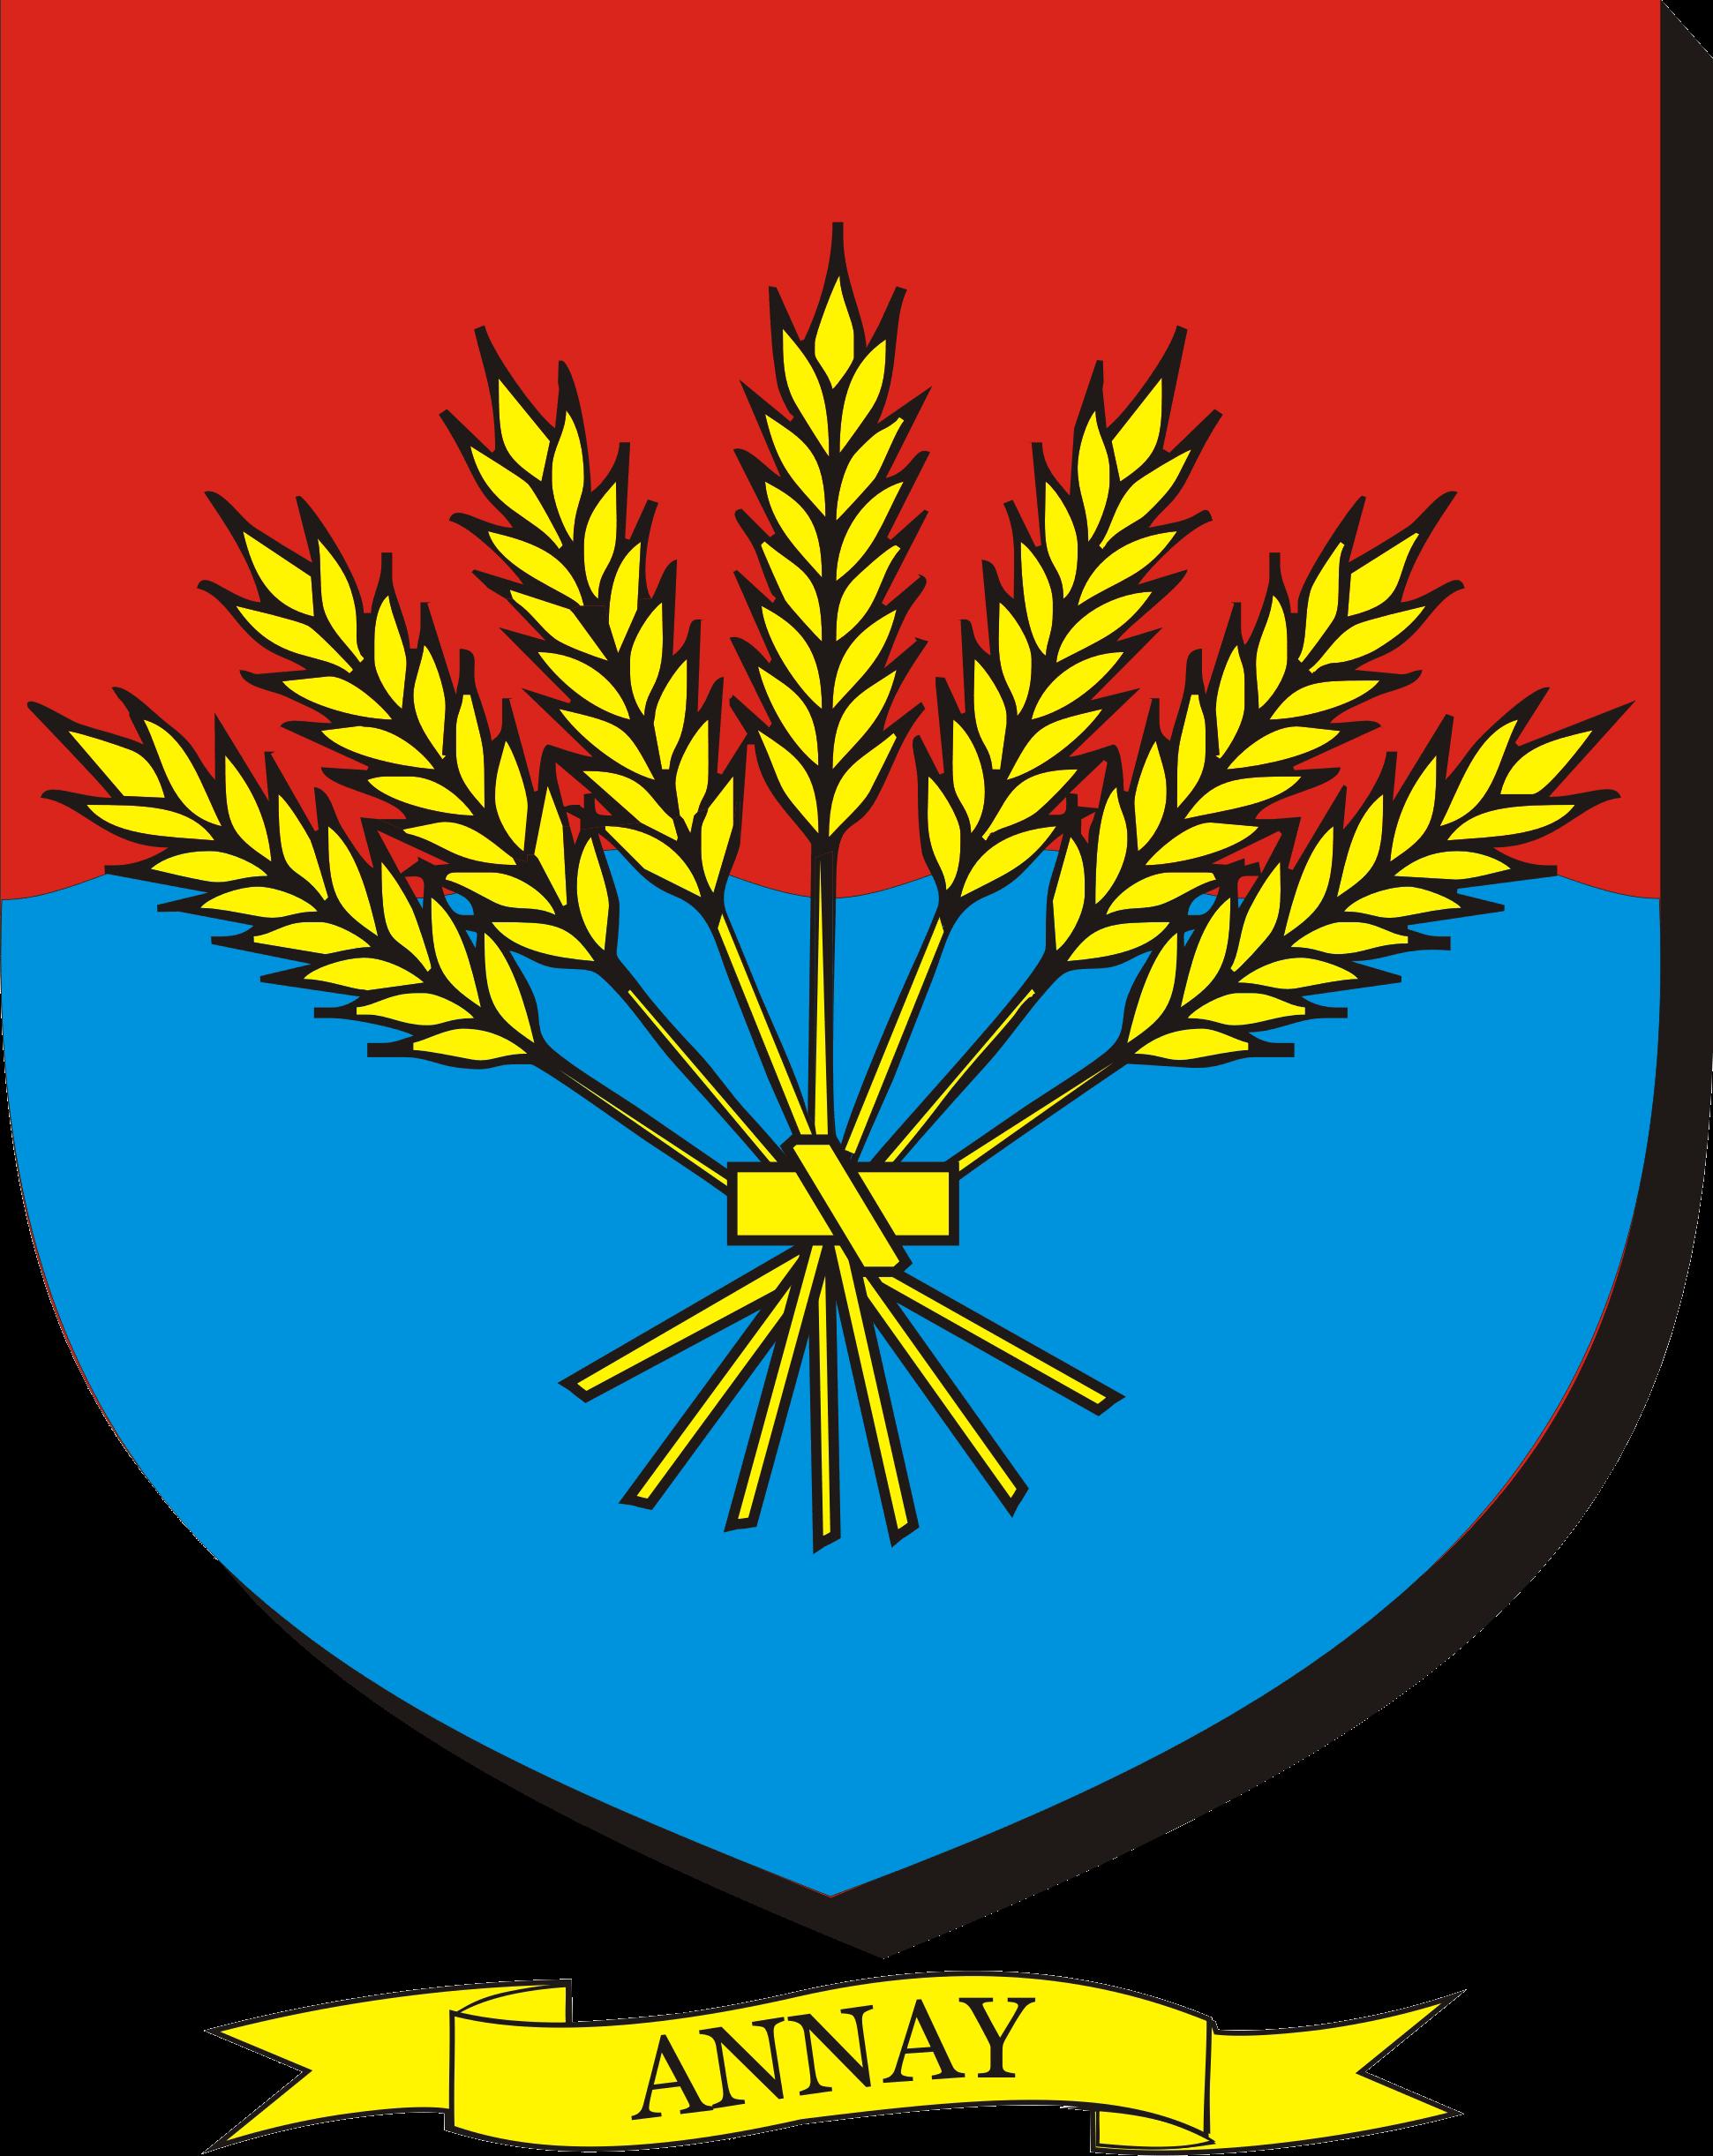 Commune de Annay